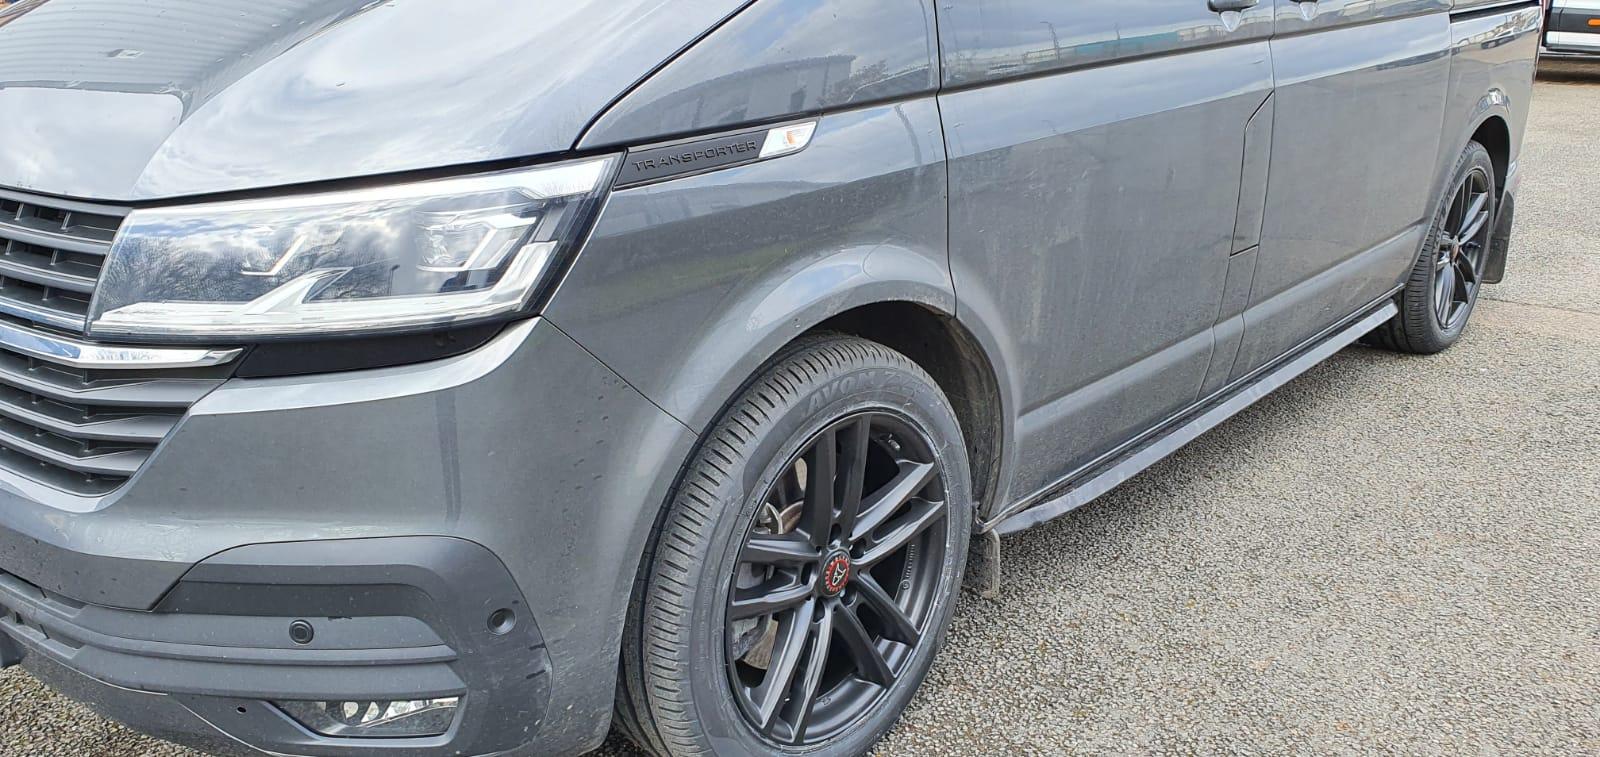 VW T6 Wheels Nottingham